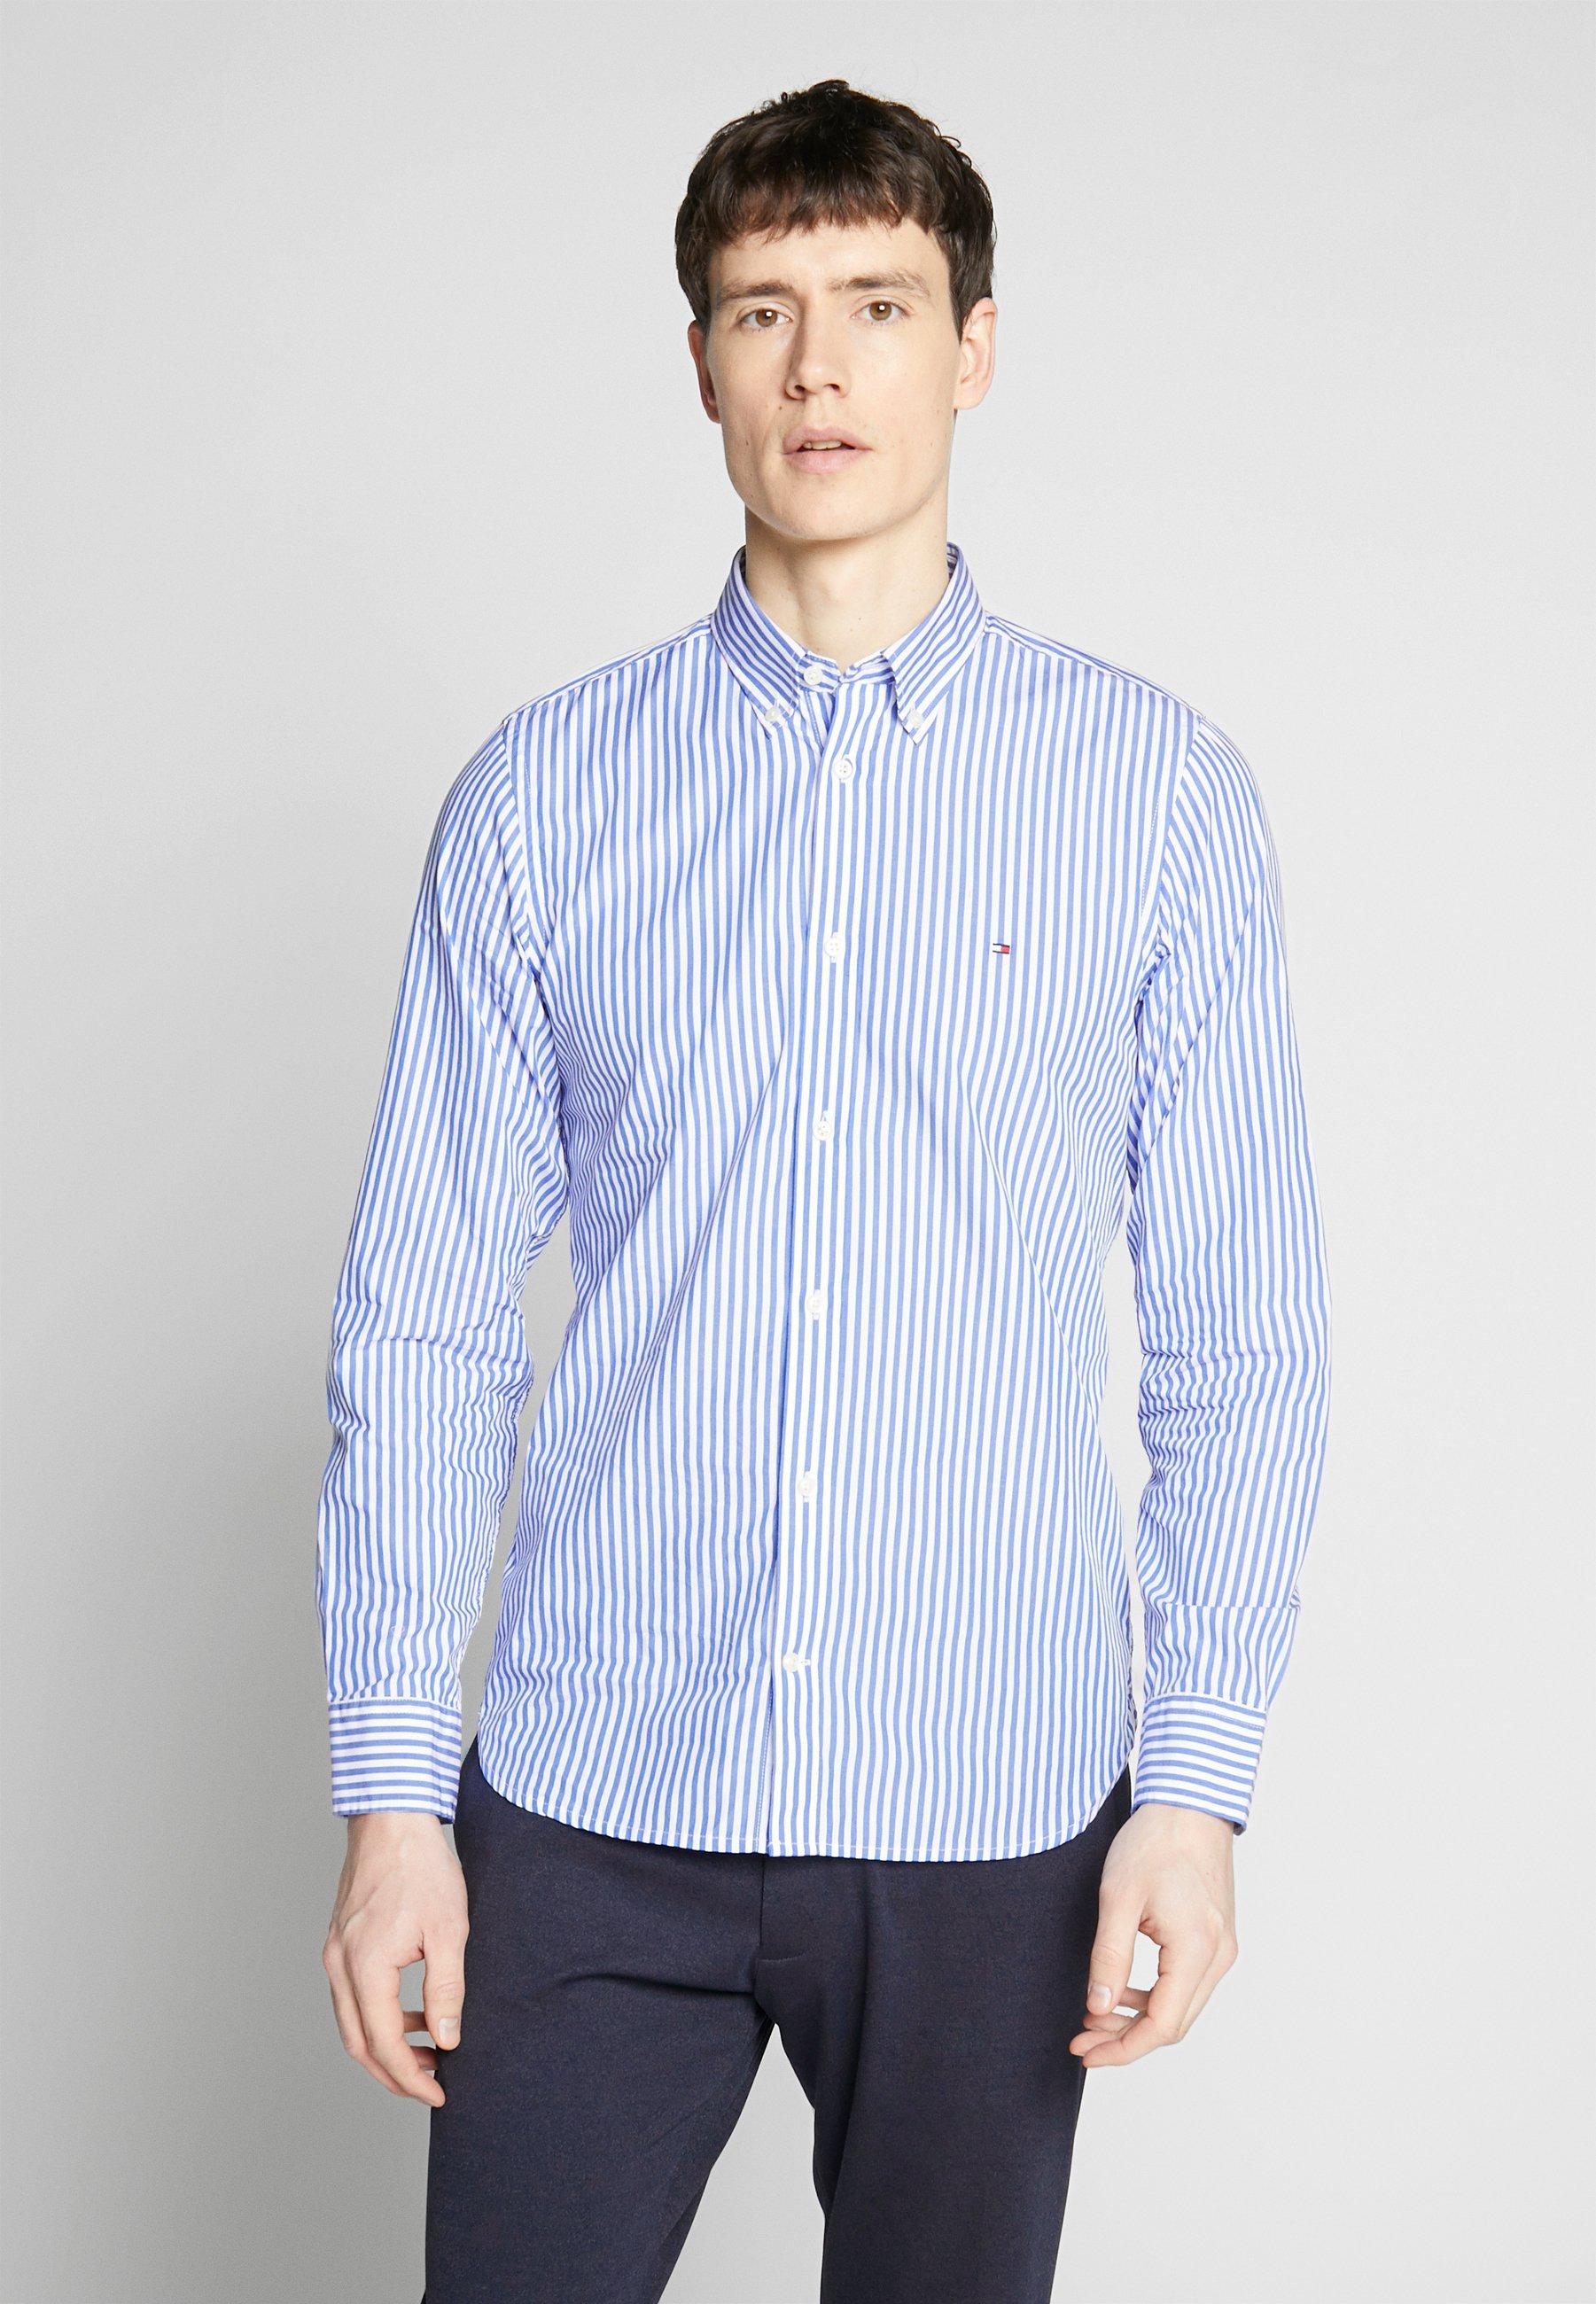 Tommy Hilfiger HYPER CLASSIC STRIPE SHIRT - Koszula - blue